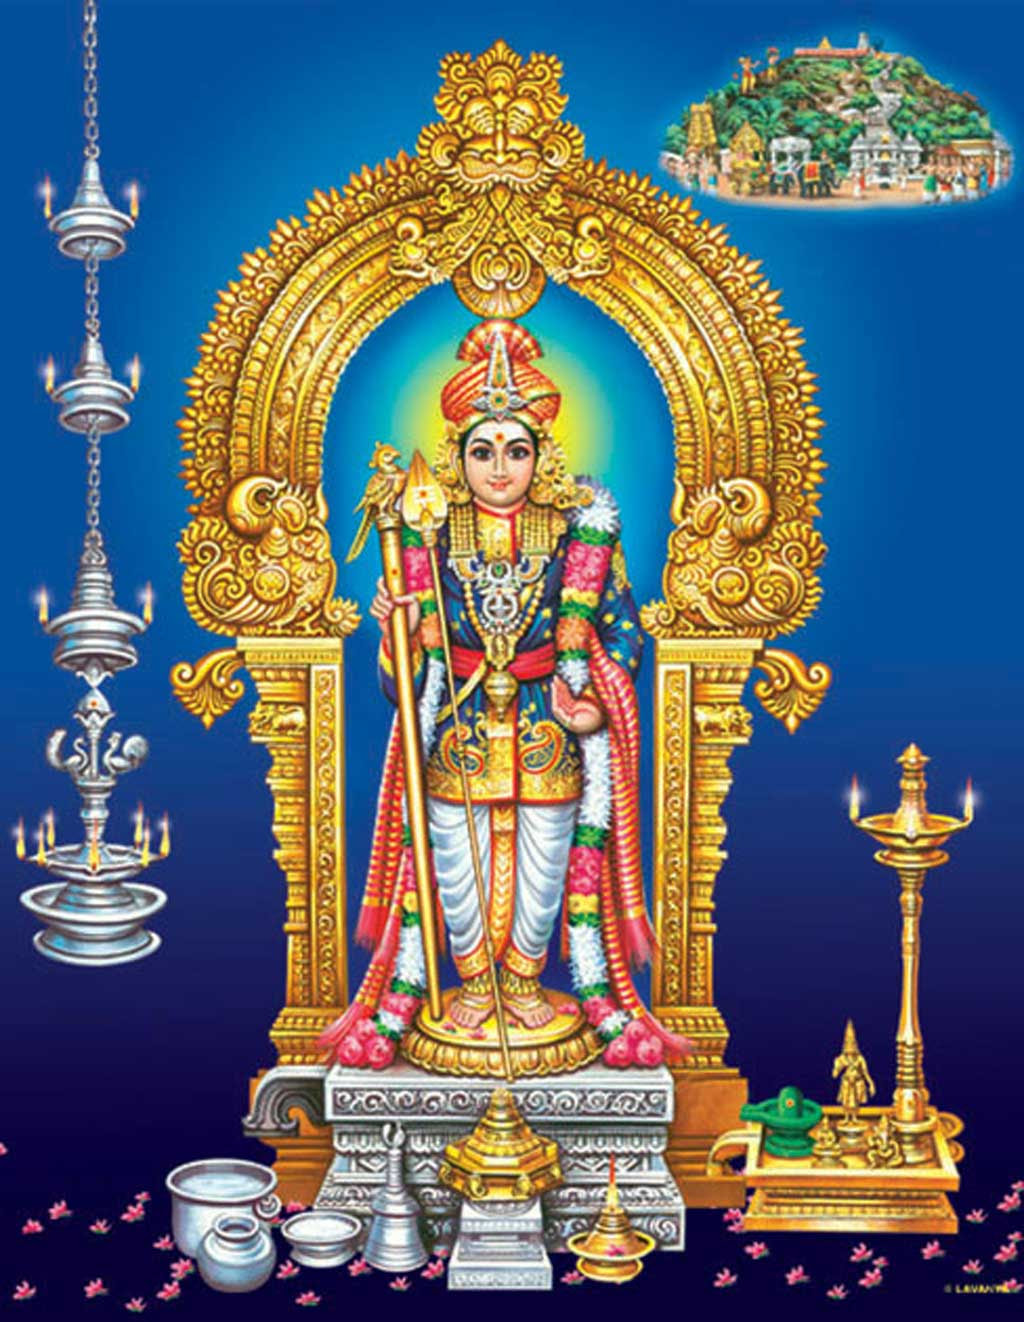 lord murugan history in tamil pdf